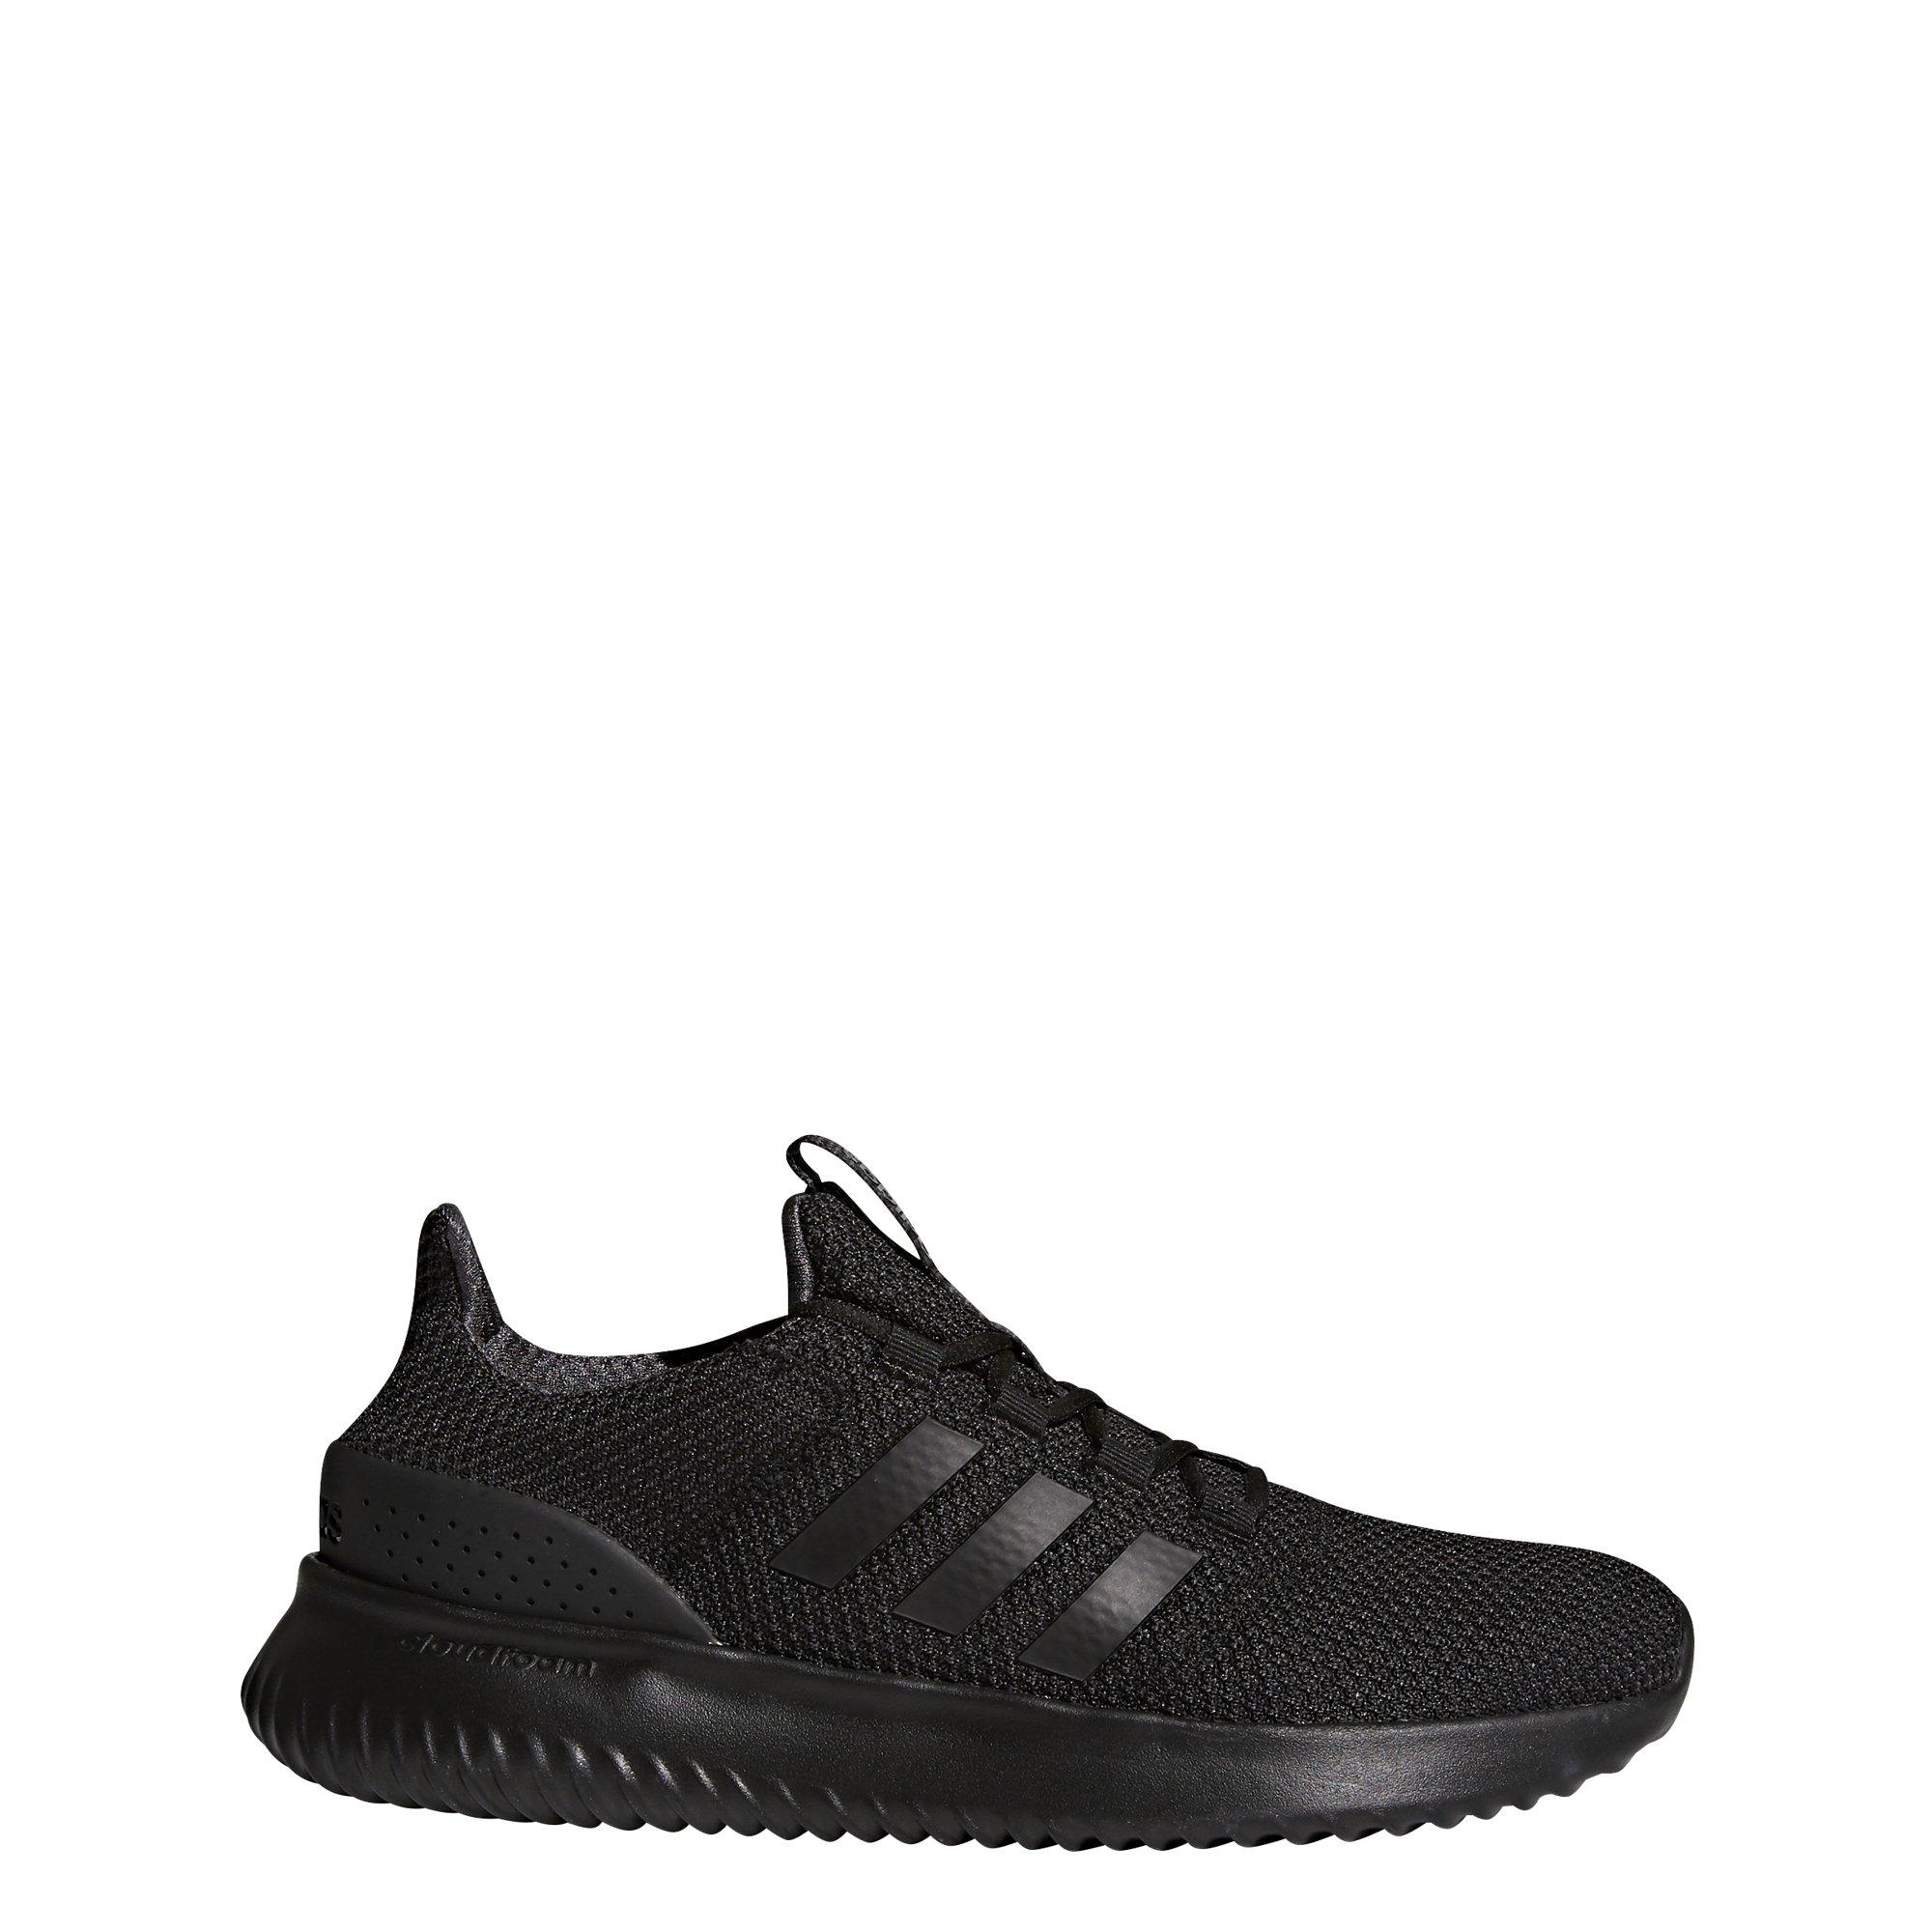 adidas Men's Cloudfoam Ultimate Running Shoe, Black/Black/Utility Black, 10.5 M US by adidas